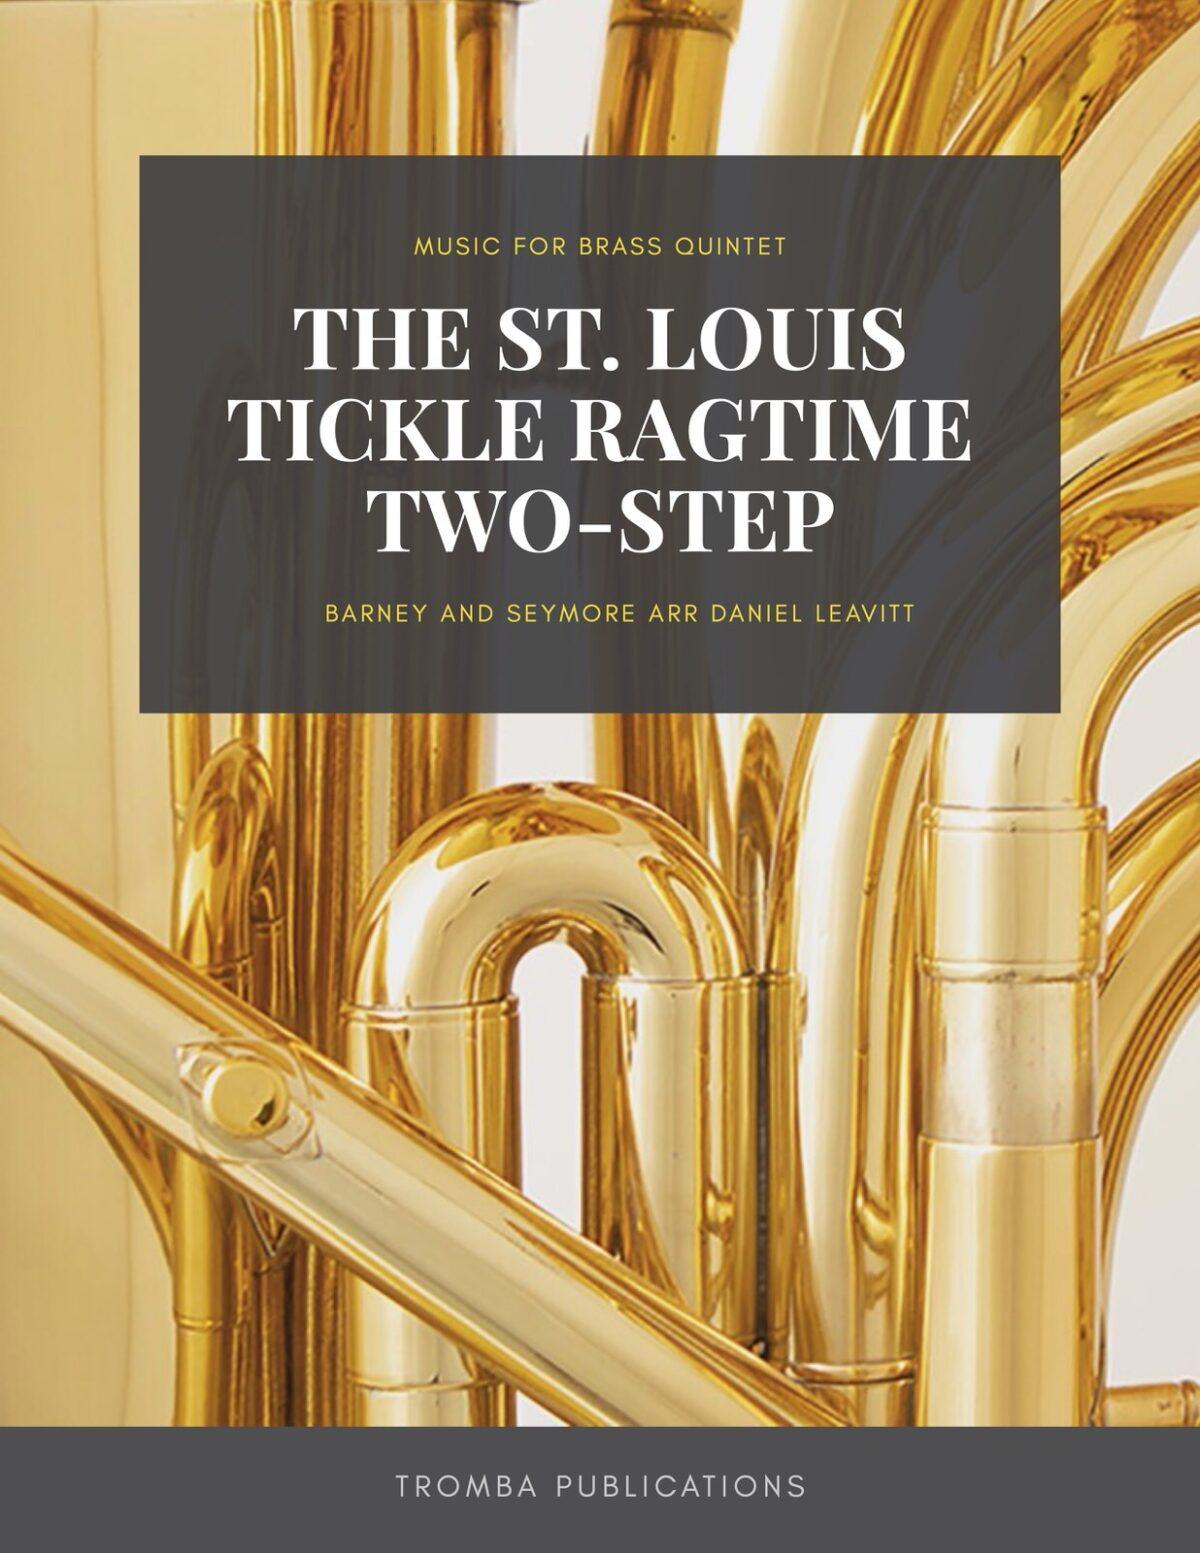 Seymore arr. Leavitt, The St. Louis Tickle Ragtime Two-Step brass quintet-p01